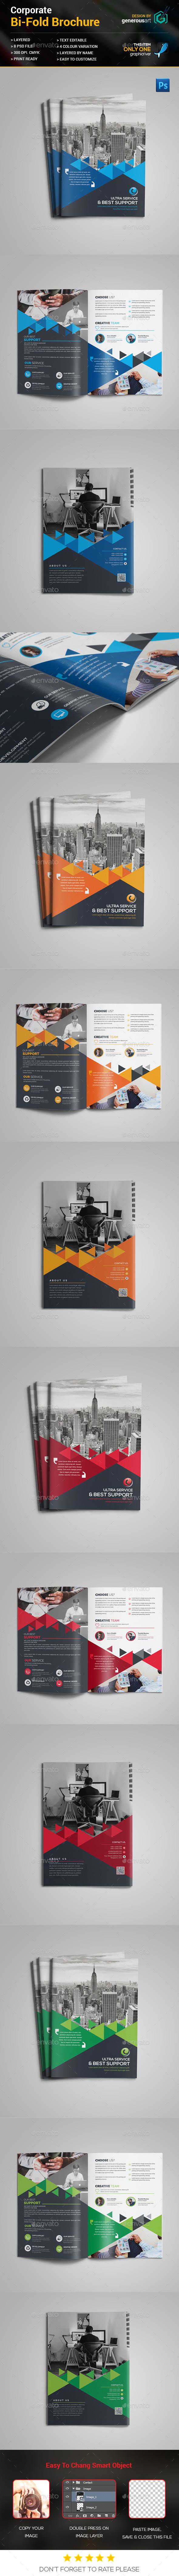 Bi-Fold_Business Brochure - Corporate Brochures